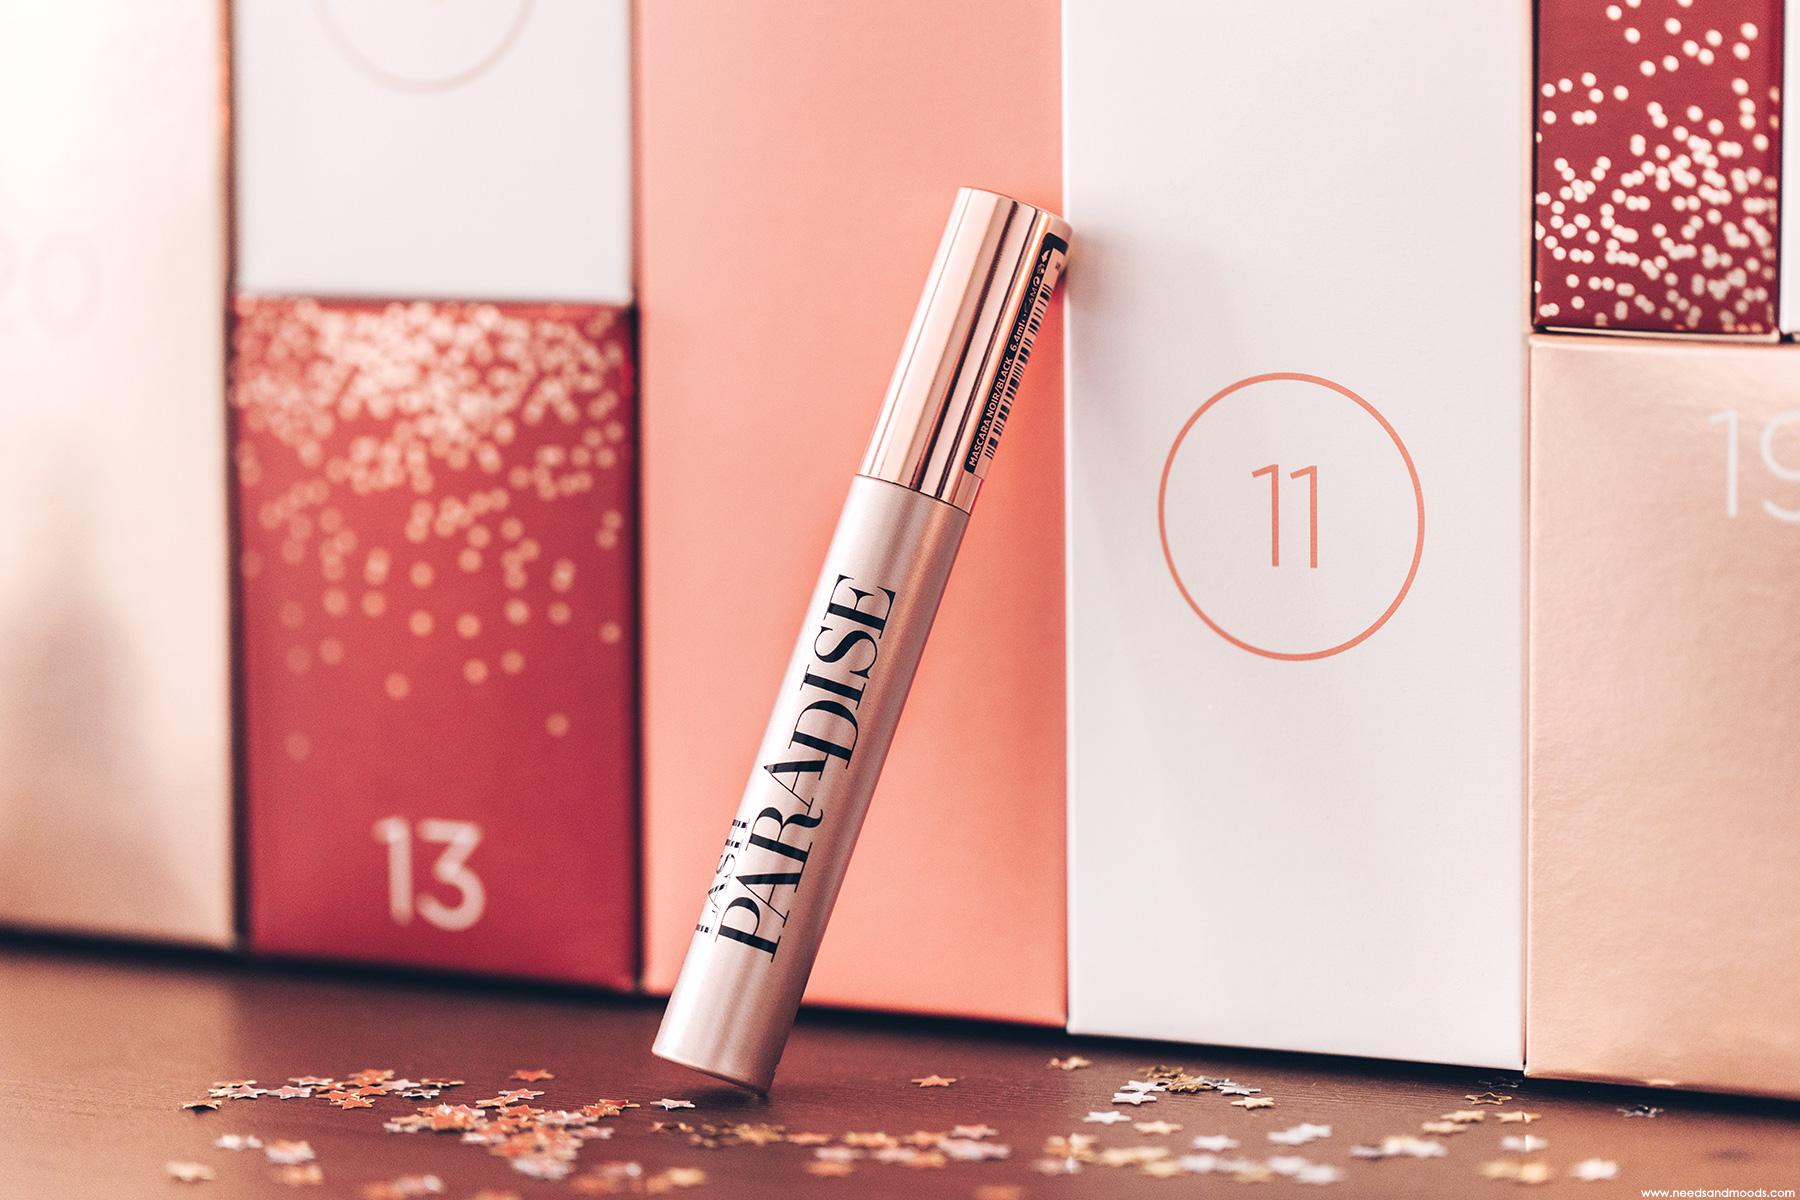 calendrier de lavent loreal mutli marques 2020 mascara